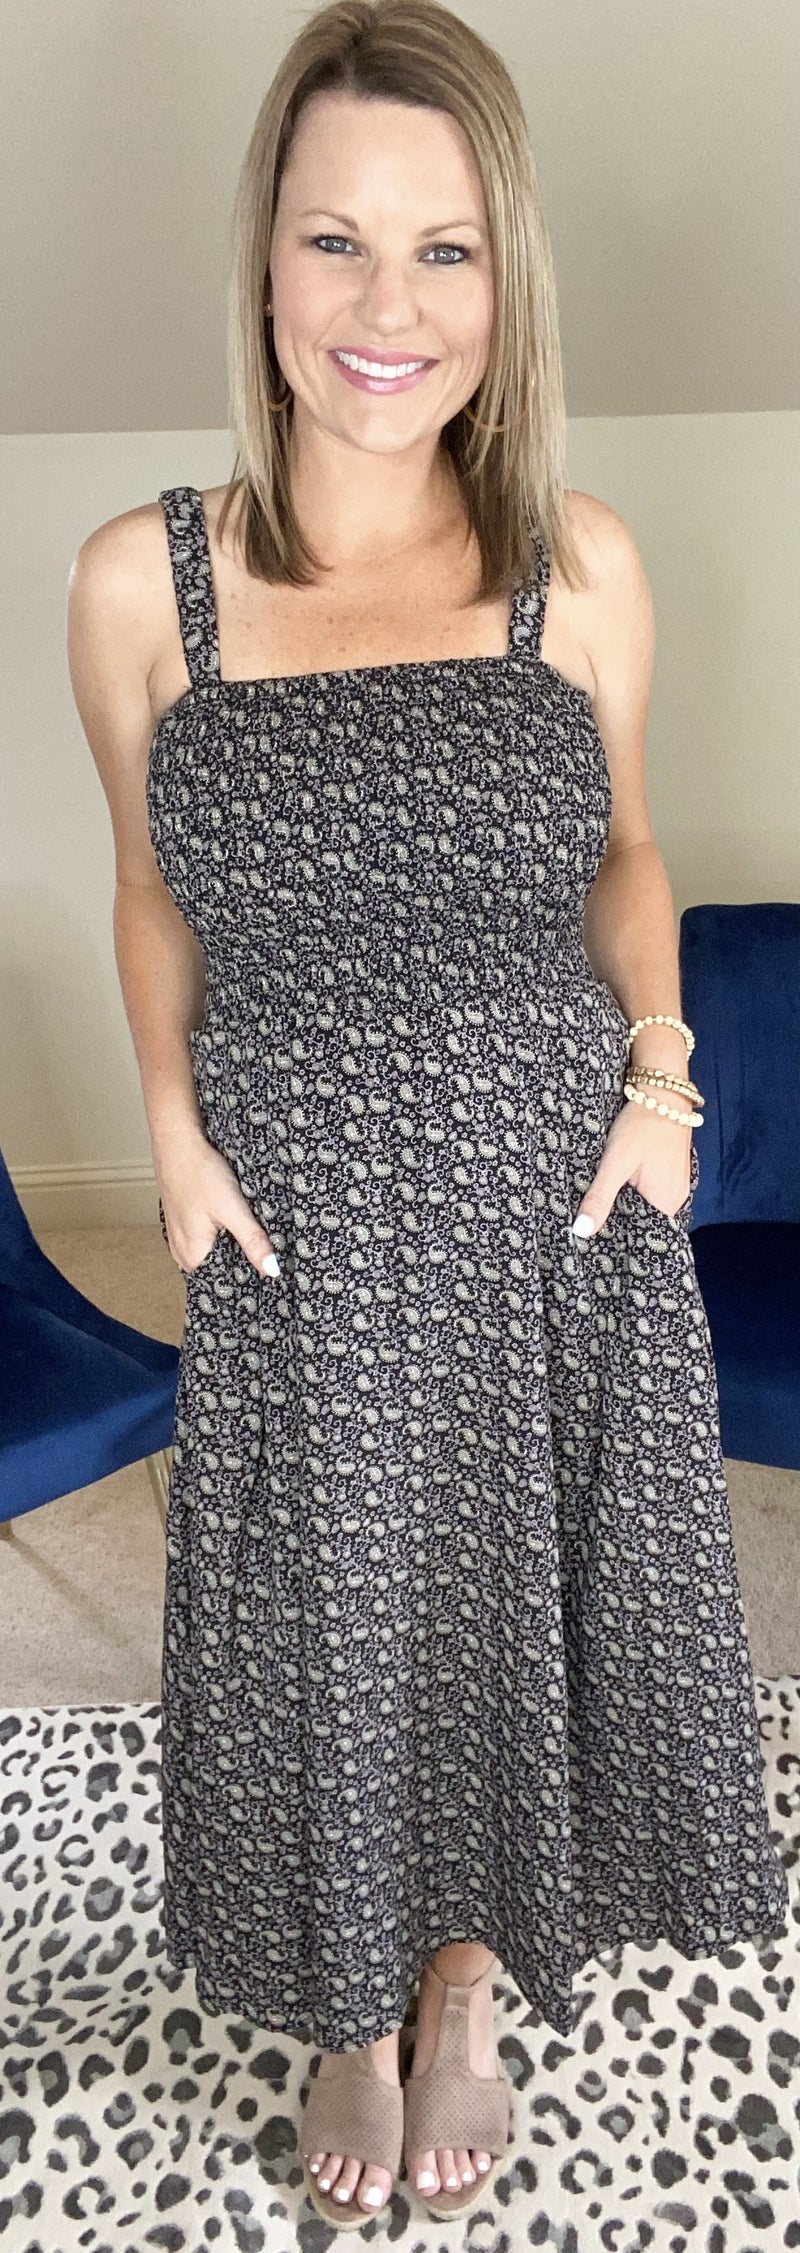 Looking Like That Dress!